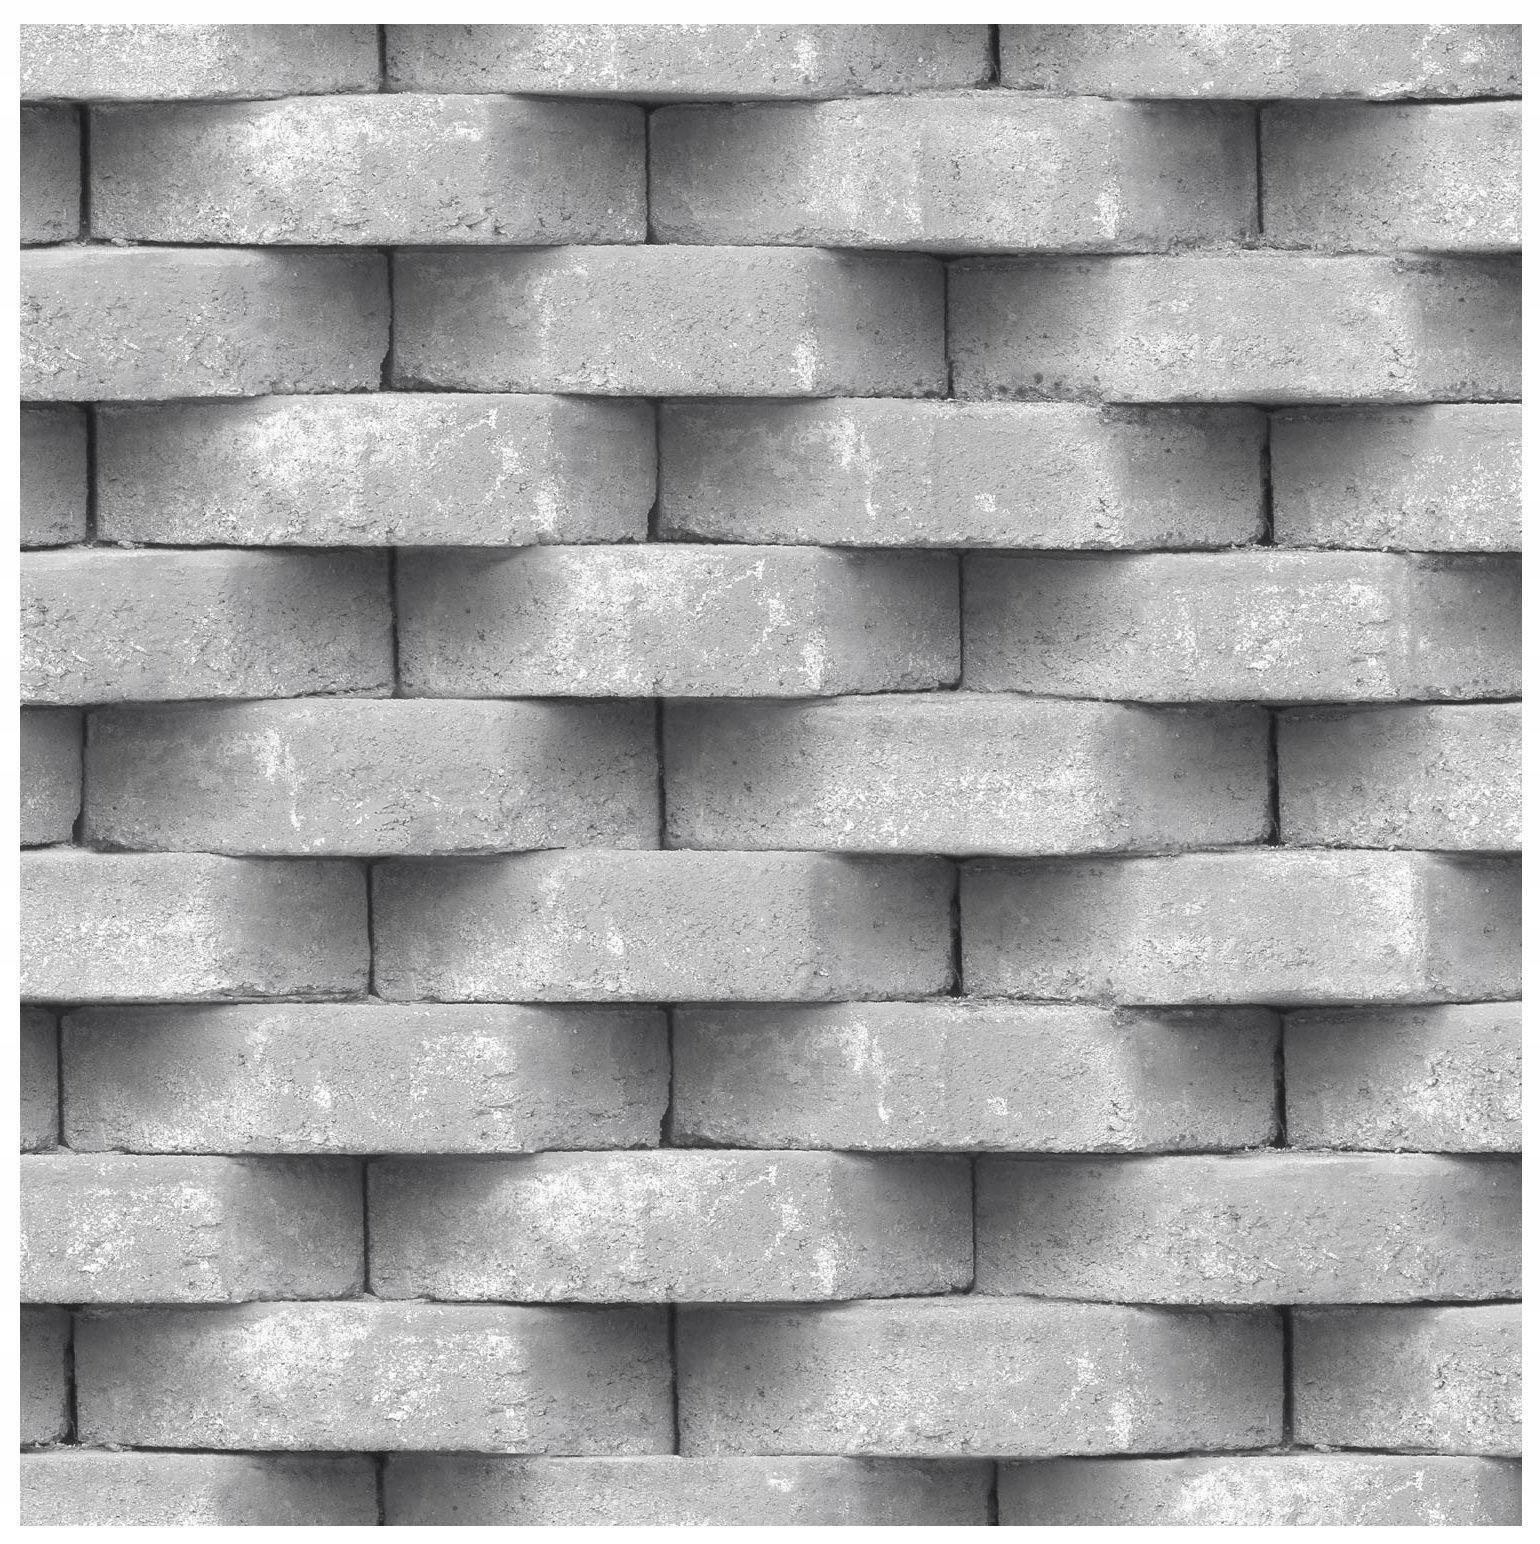 Tapeta 3D cegła na scianę winylowa beton szara